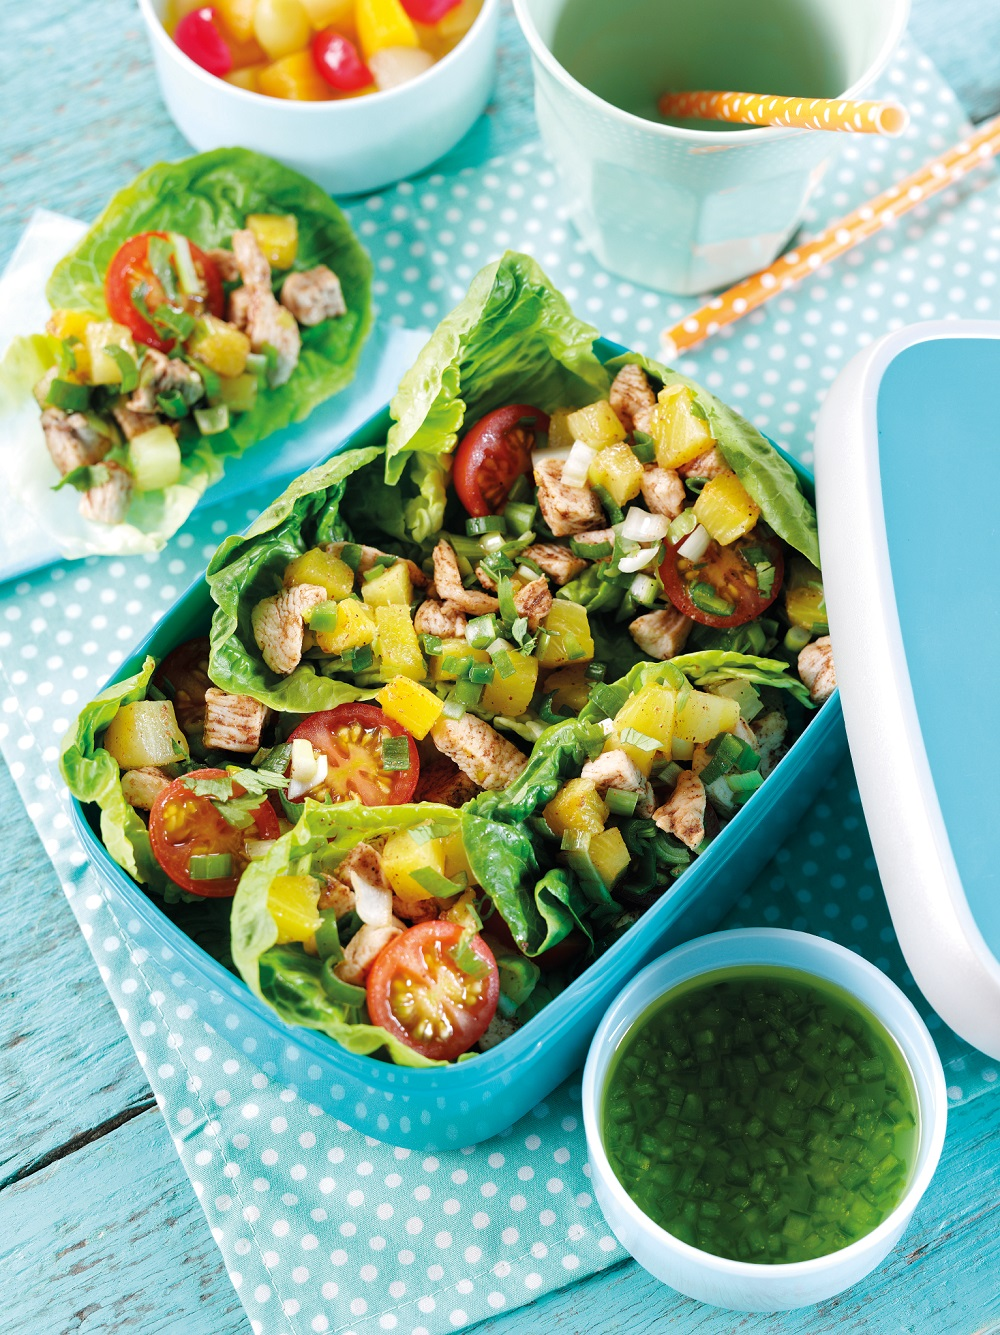 Pineapple & Chicken Salad Cups: